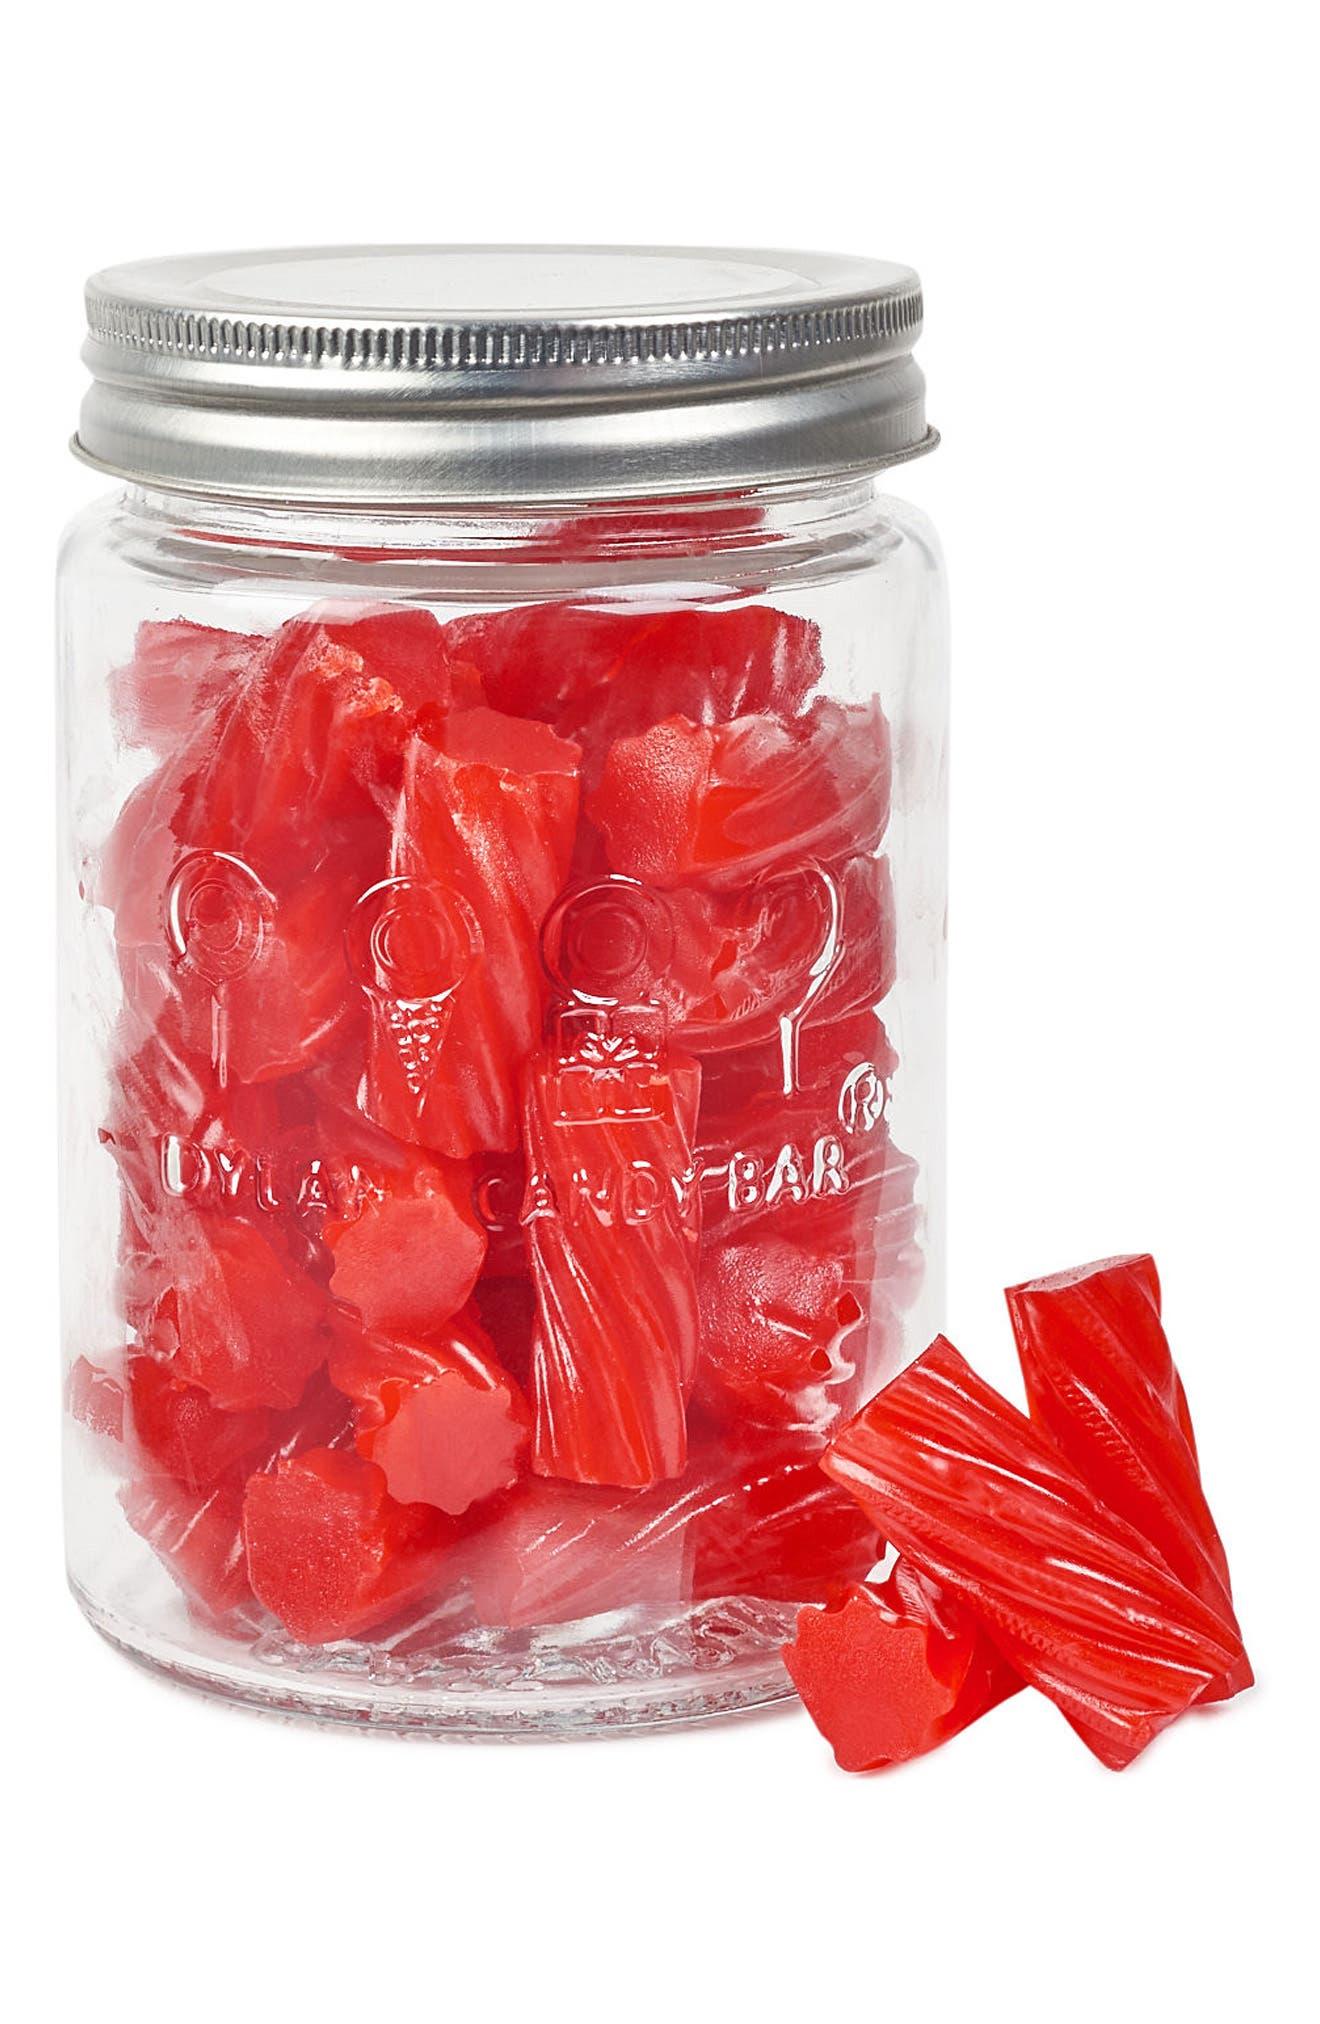 Red Licorice Filled Mason Jar,                             Main thumbnail 1, color,